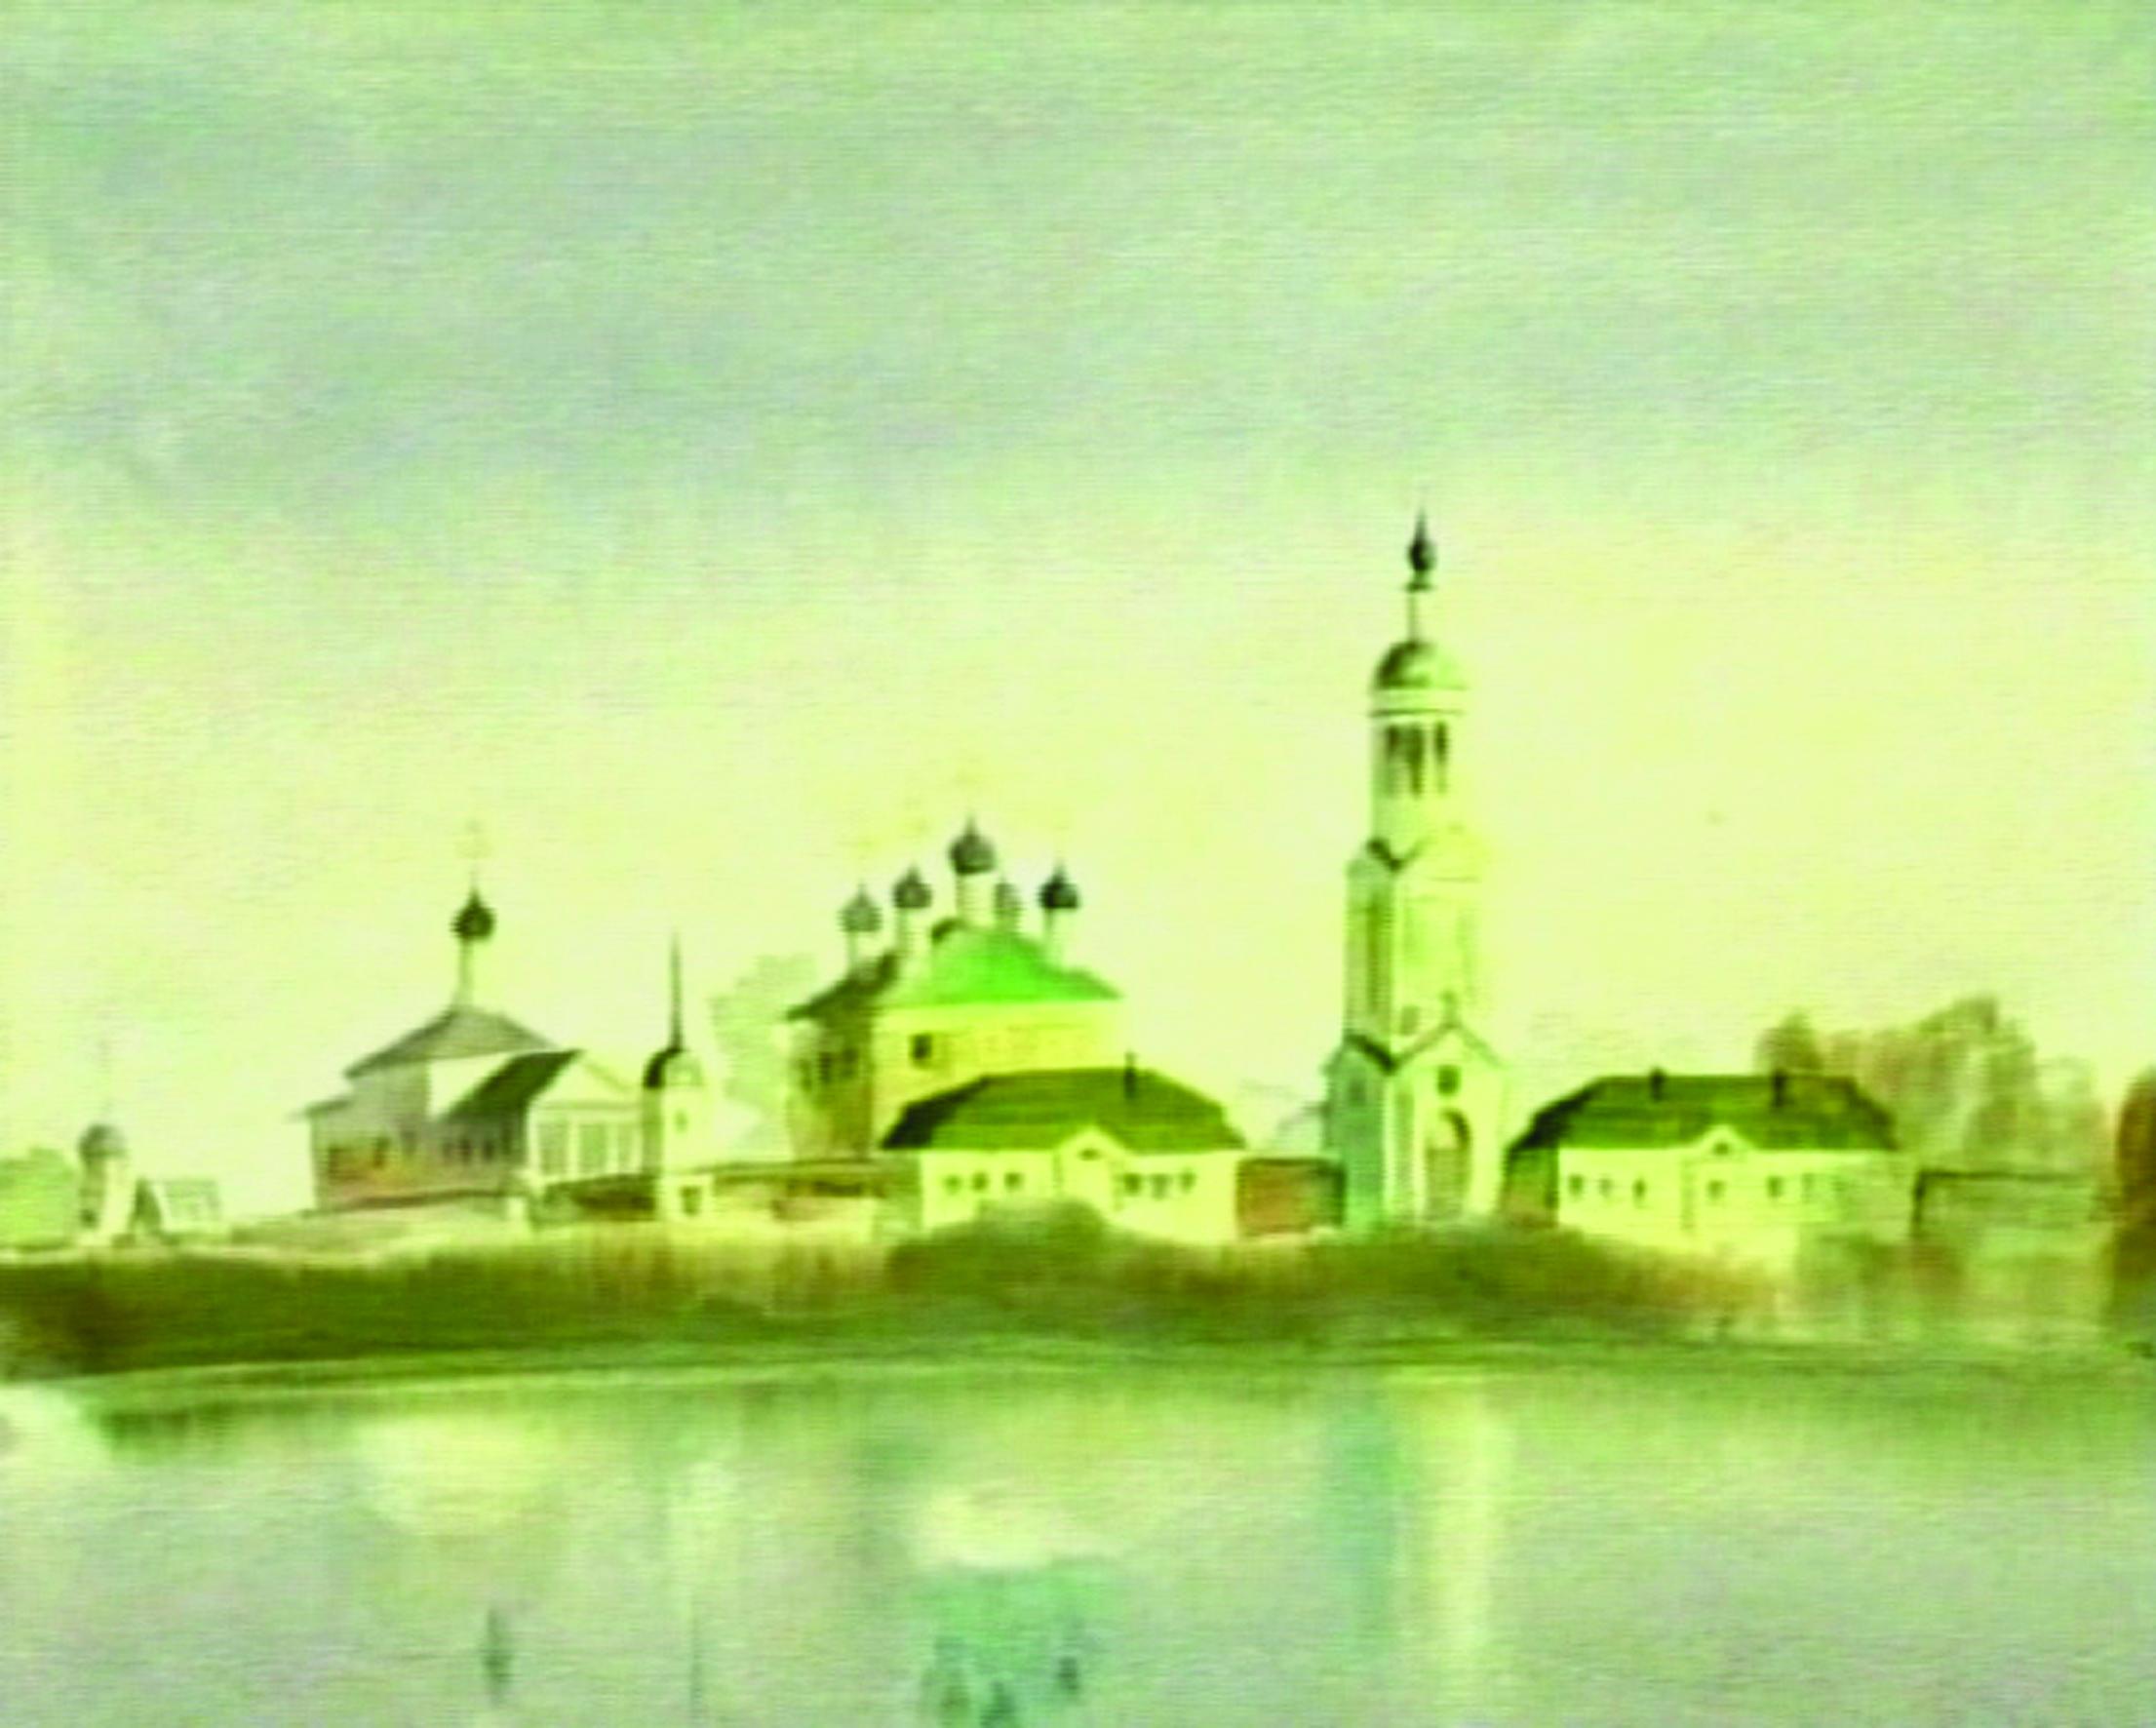 старо-чернеевский монастырь.jpg